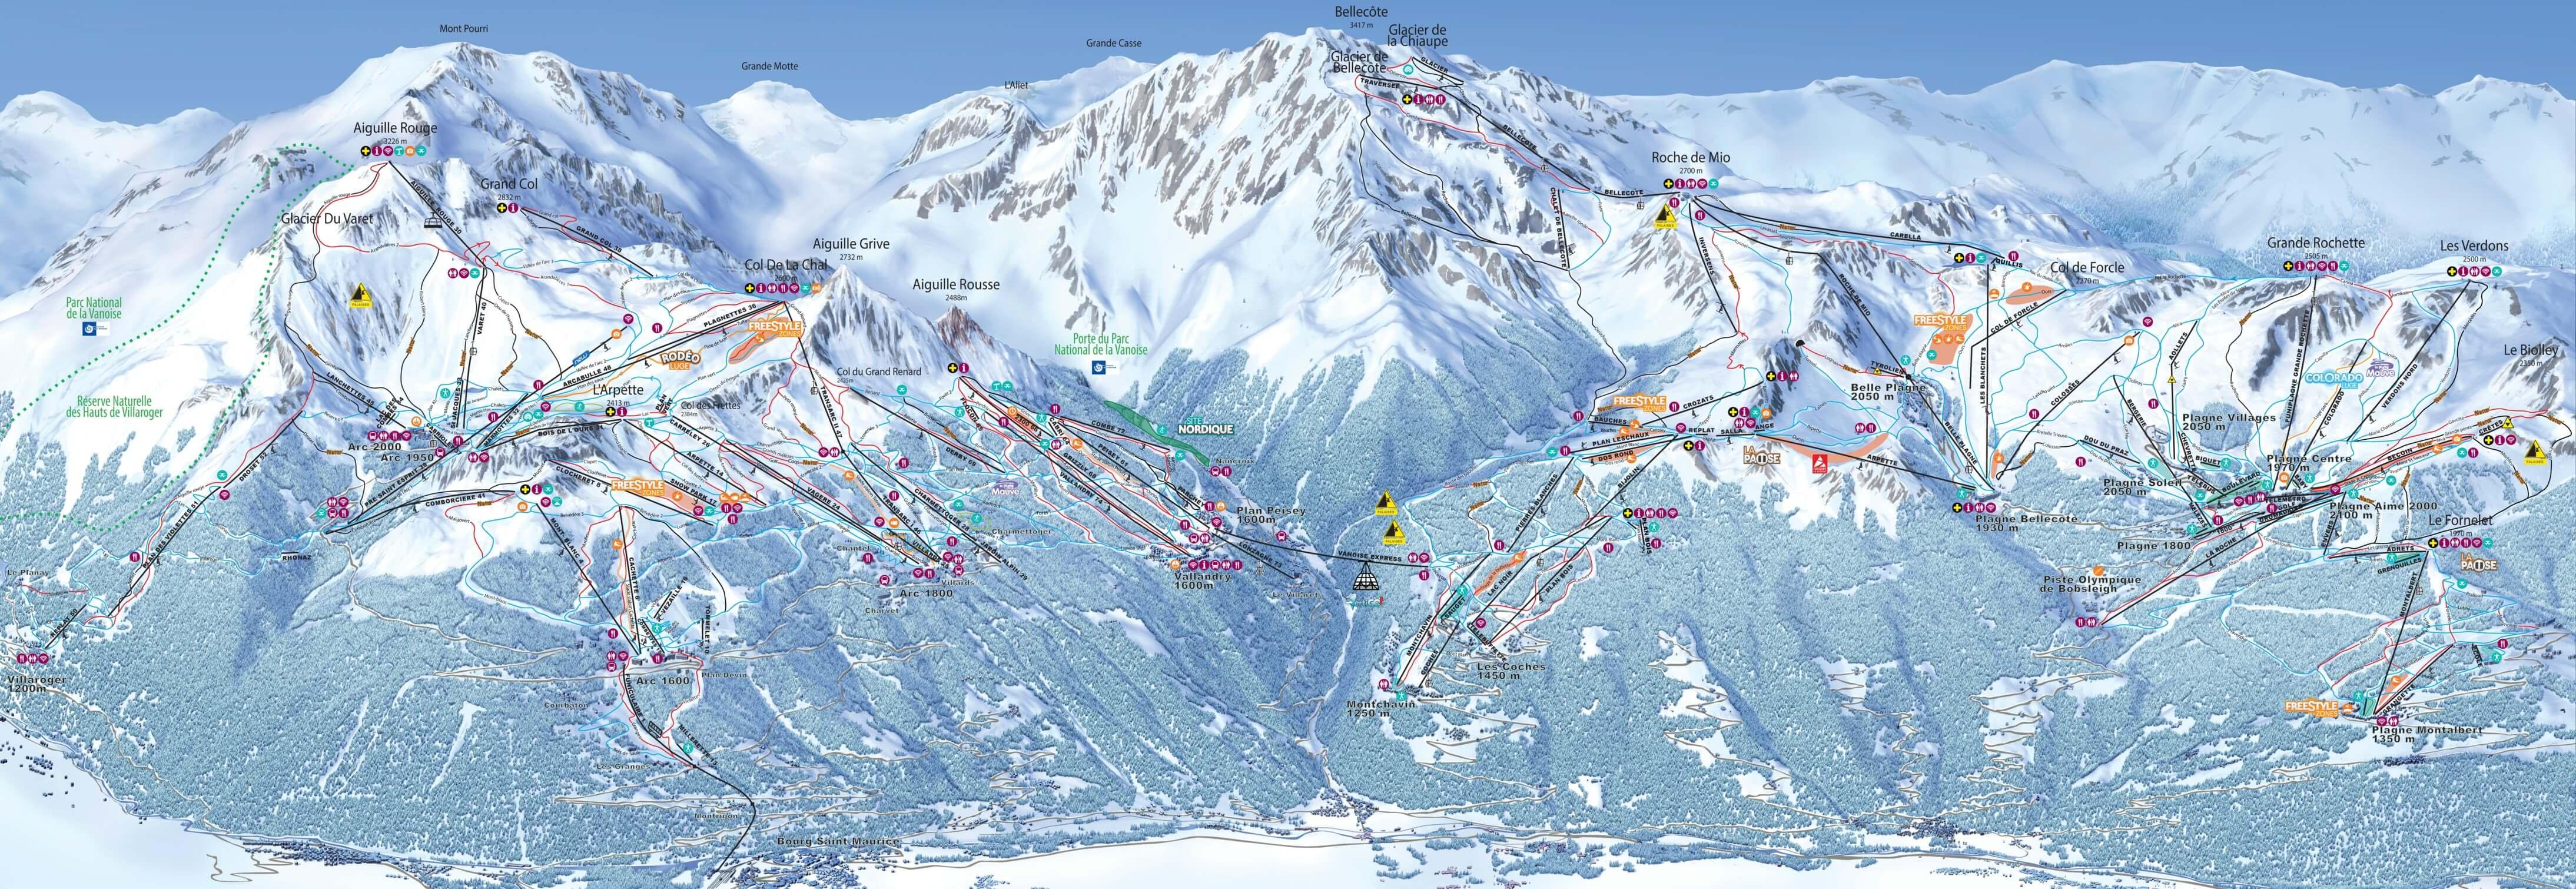 Ski resort La Plagne - Slopes - TopSkiResort.com